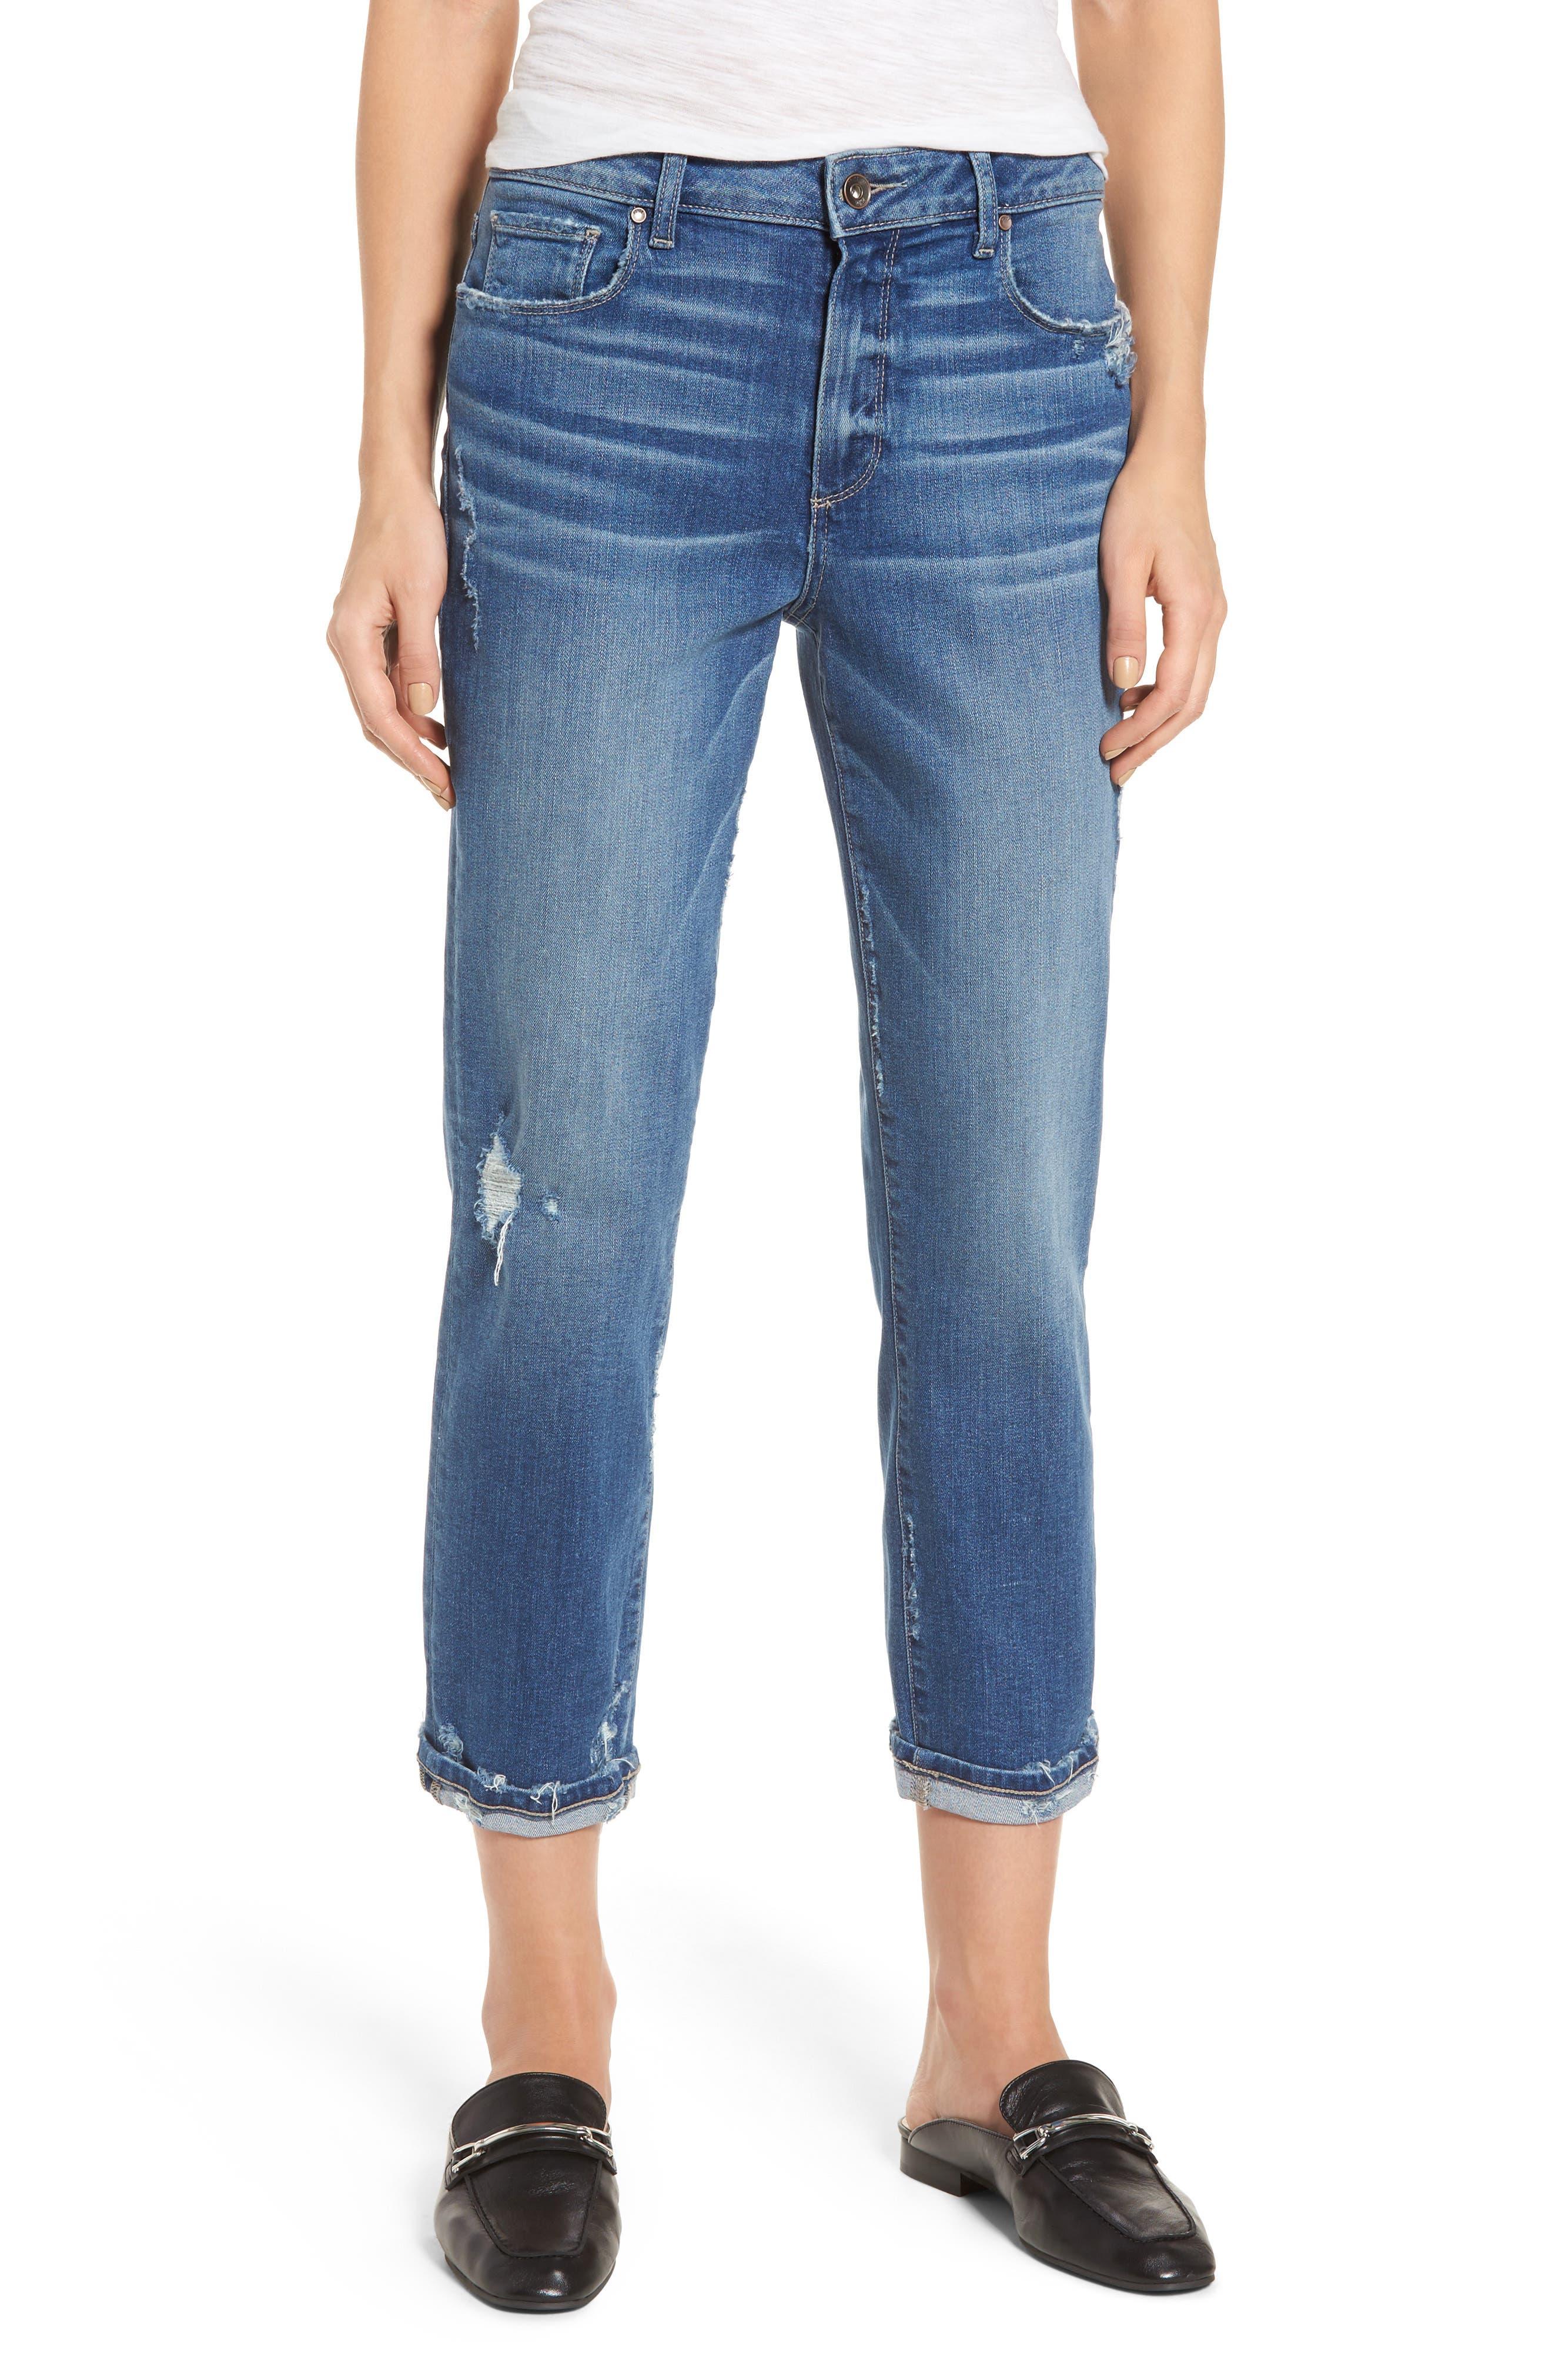 PAIGE Jimmy Jimmy High Waist Crop Boyfriend Jeans (Ludlow Destructed)